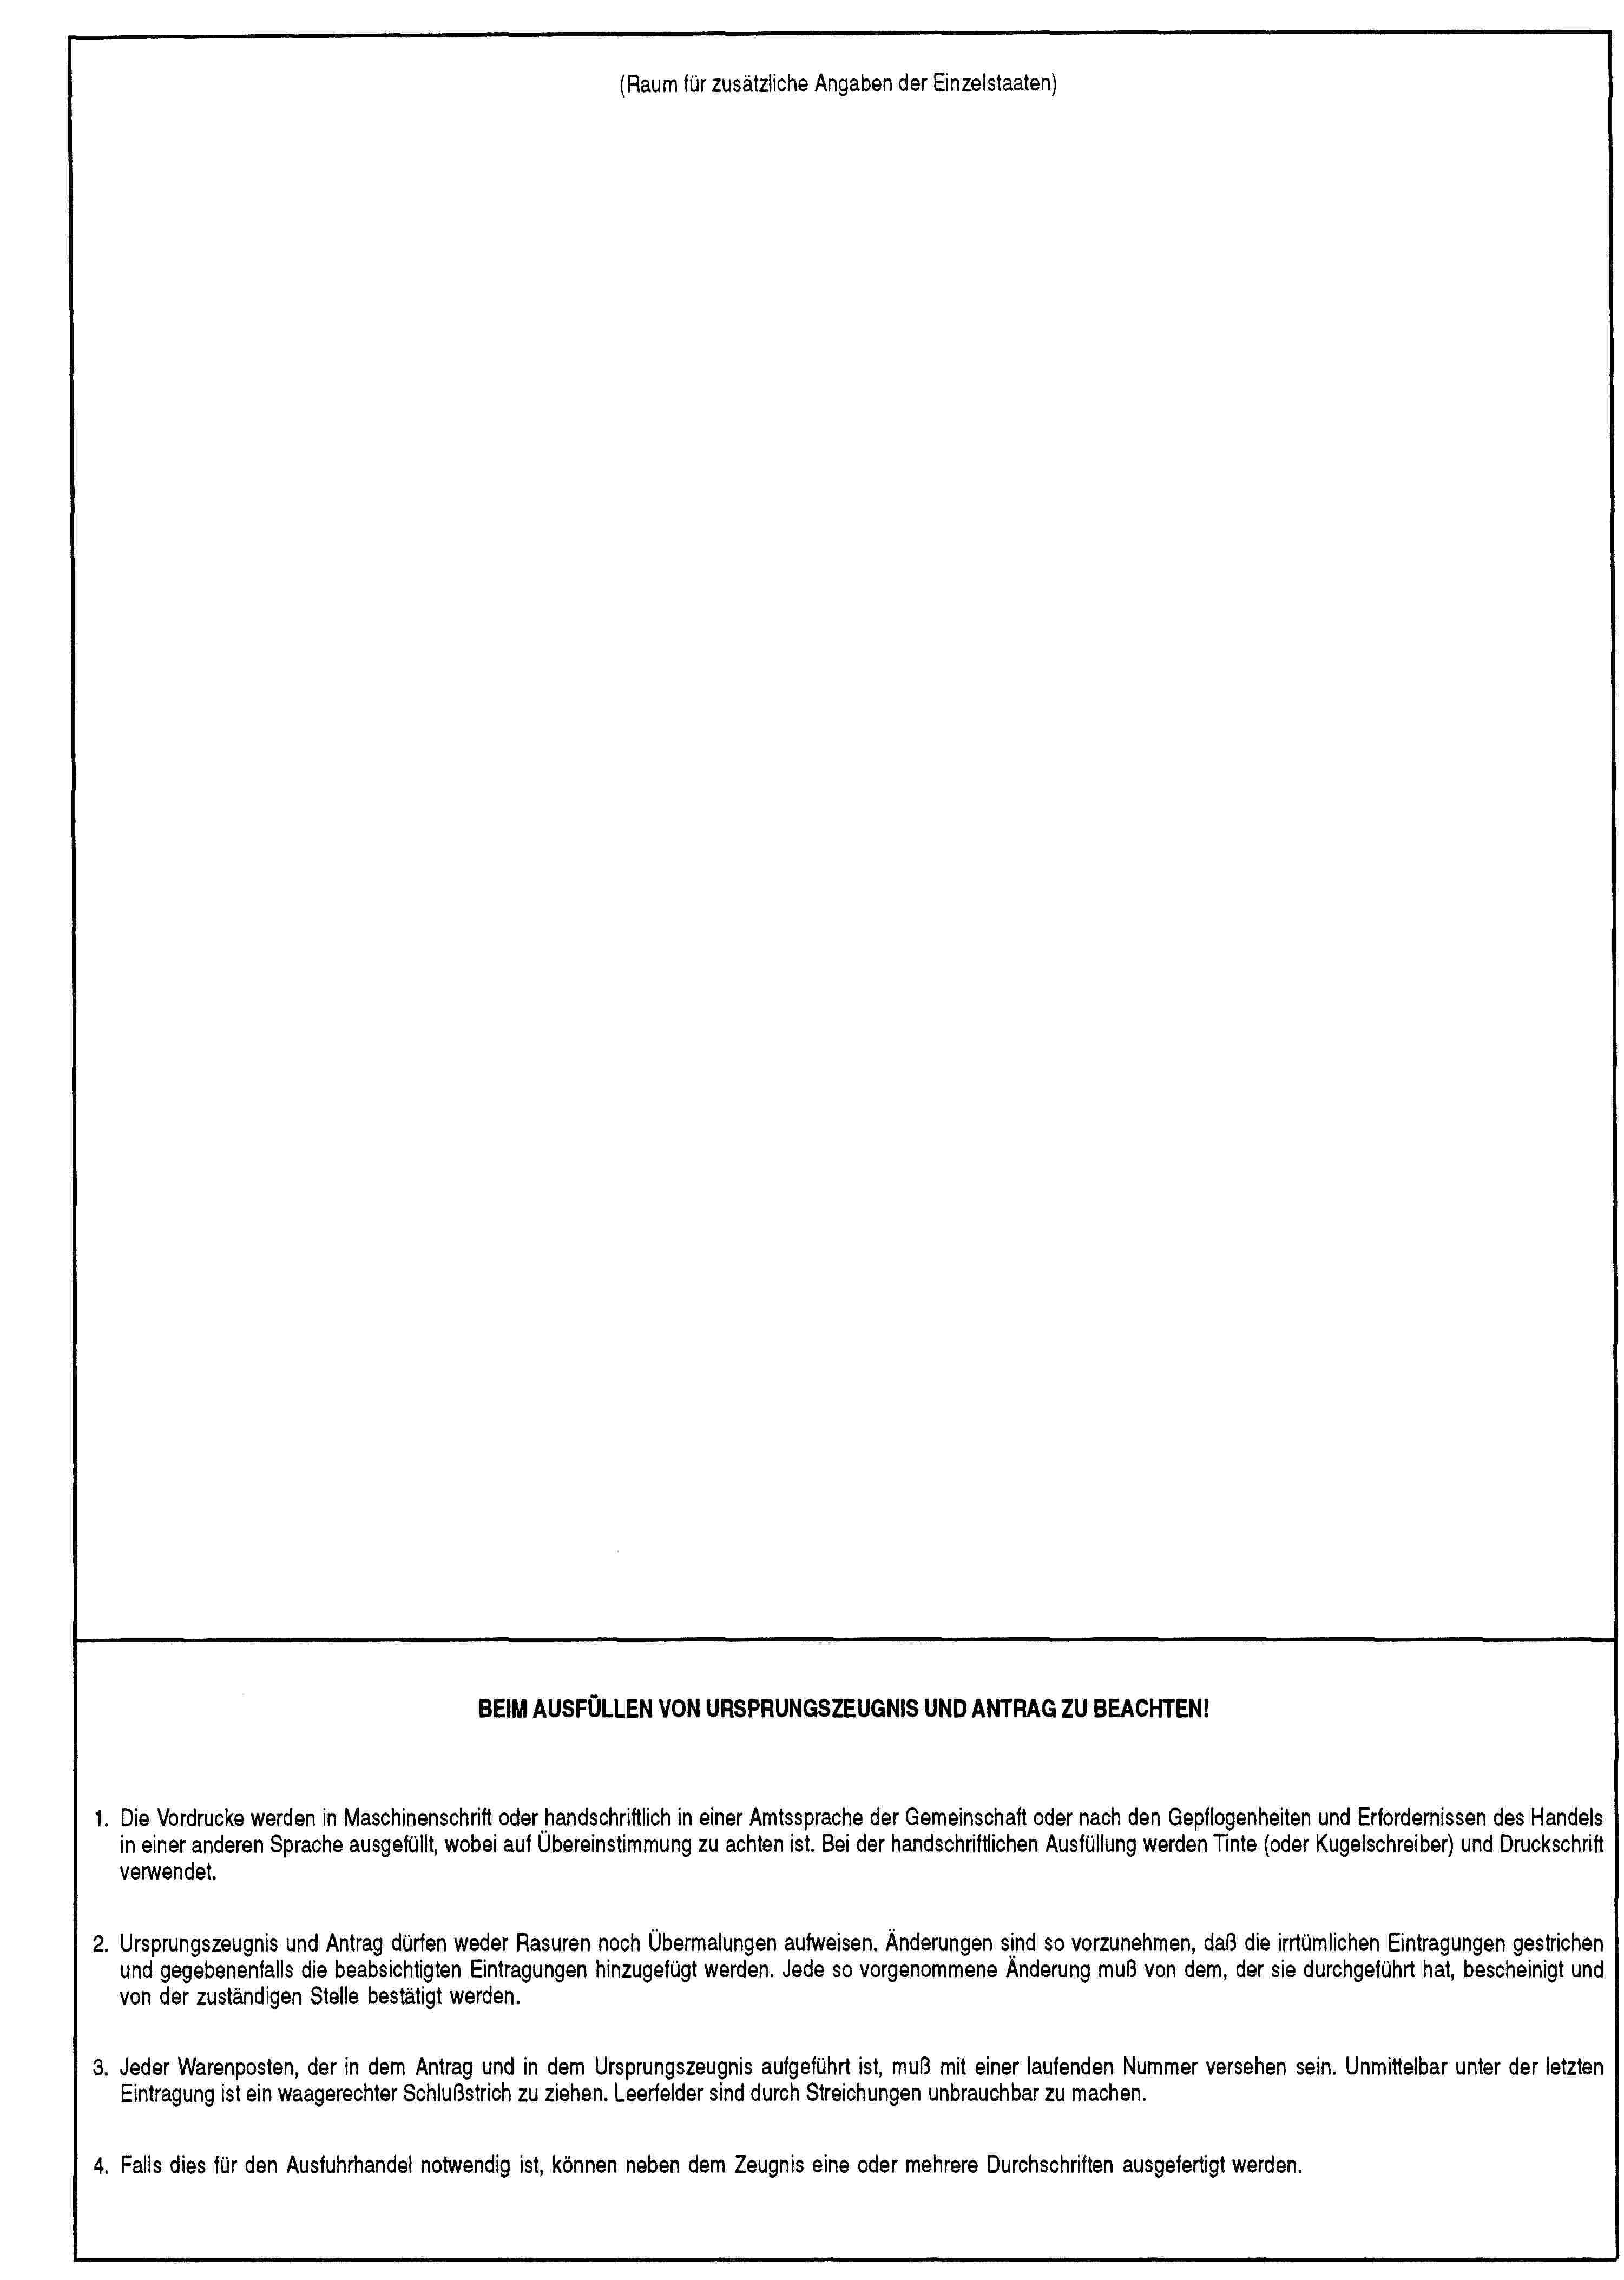 EUR-Lex - 01993R2454-20110101 - EN - EUR-Lex